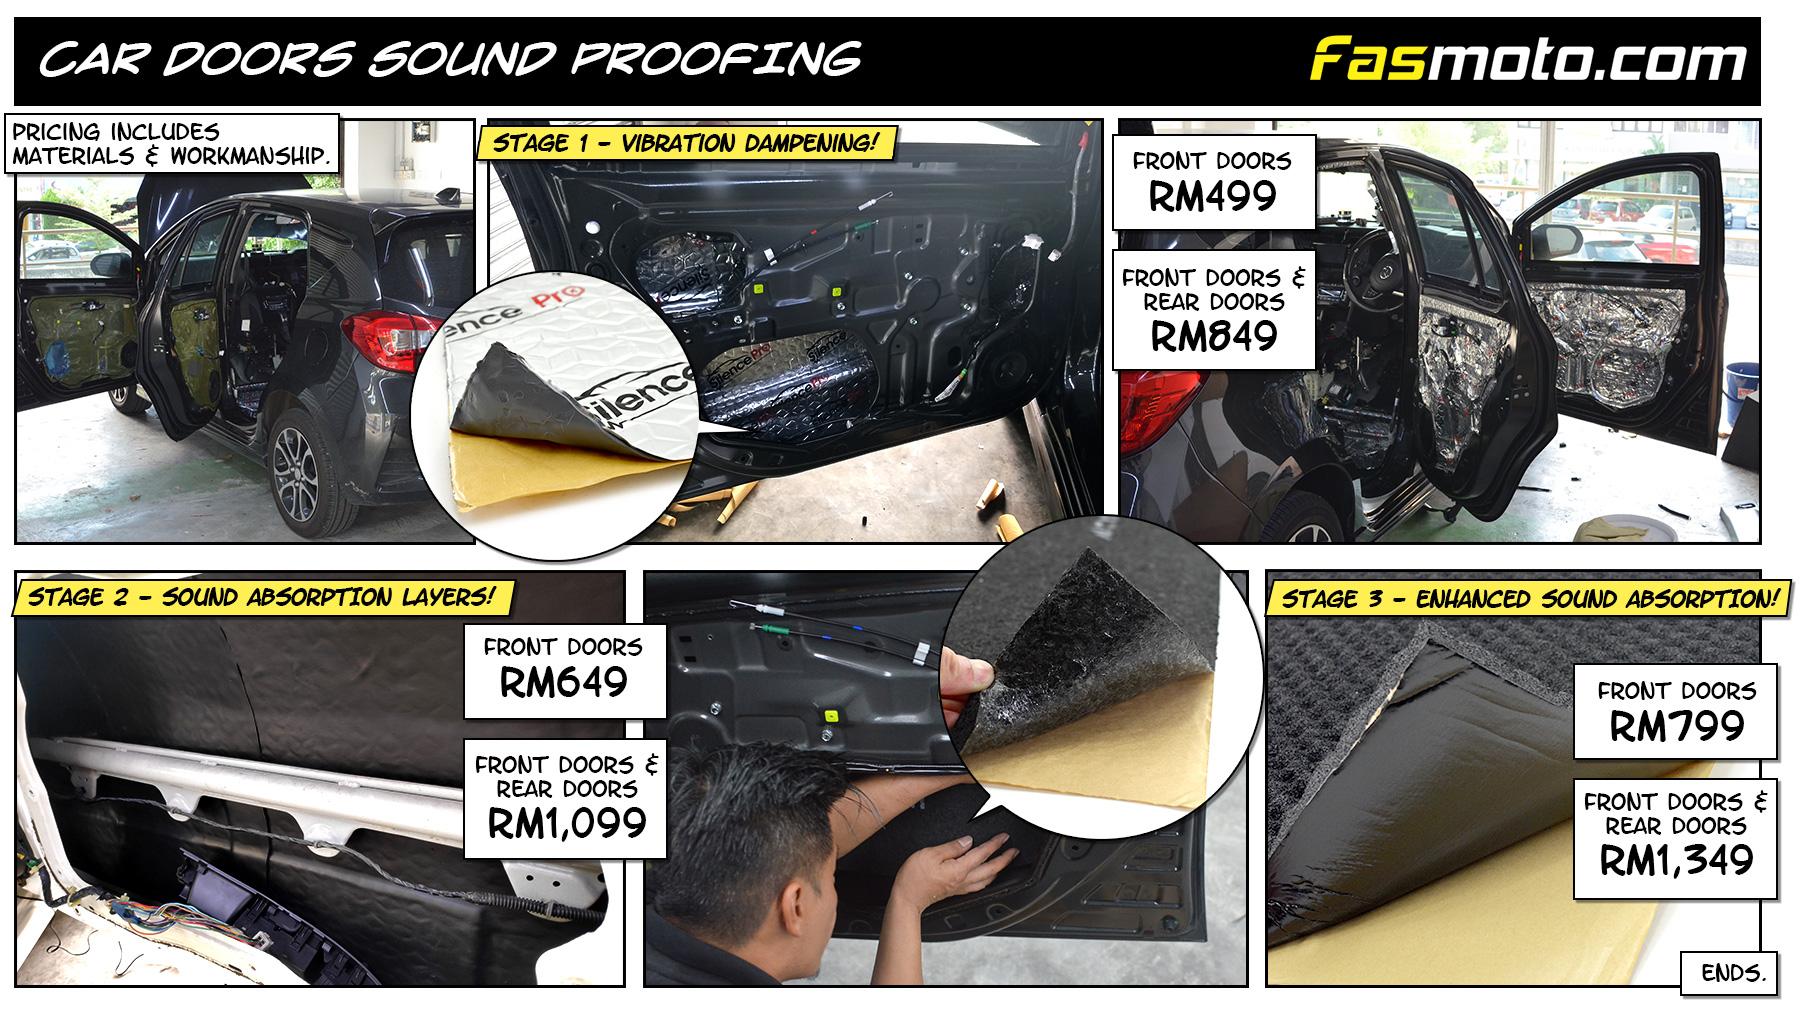 Car Doors Sound Proofing Malaysia, Kuala Lumpur, Klang Valley